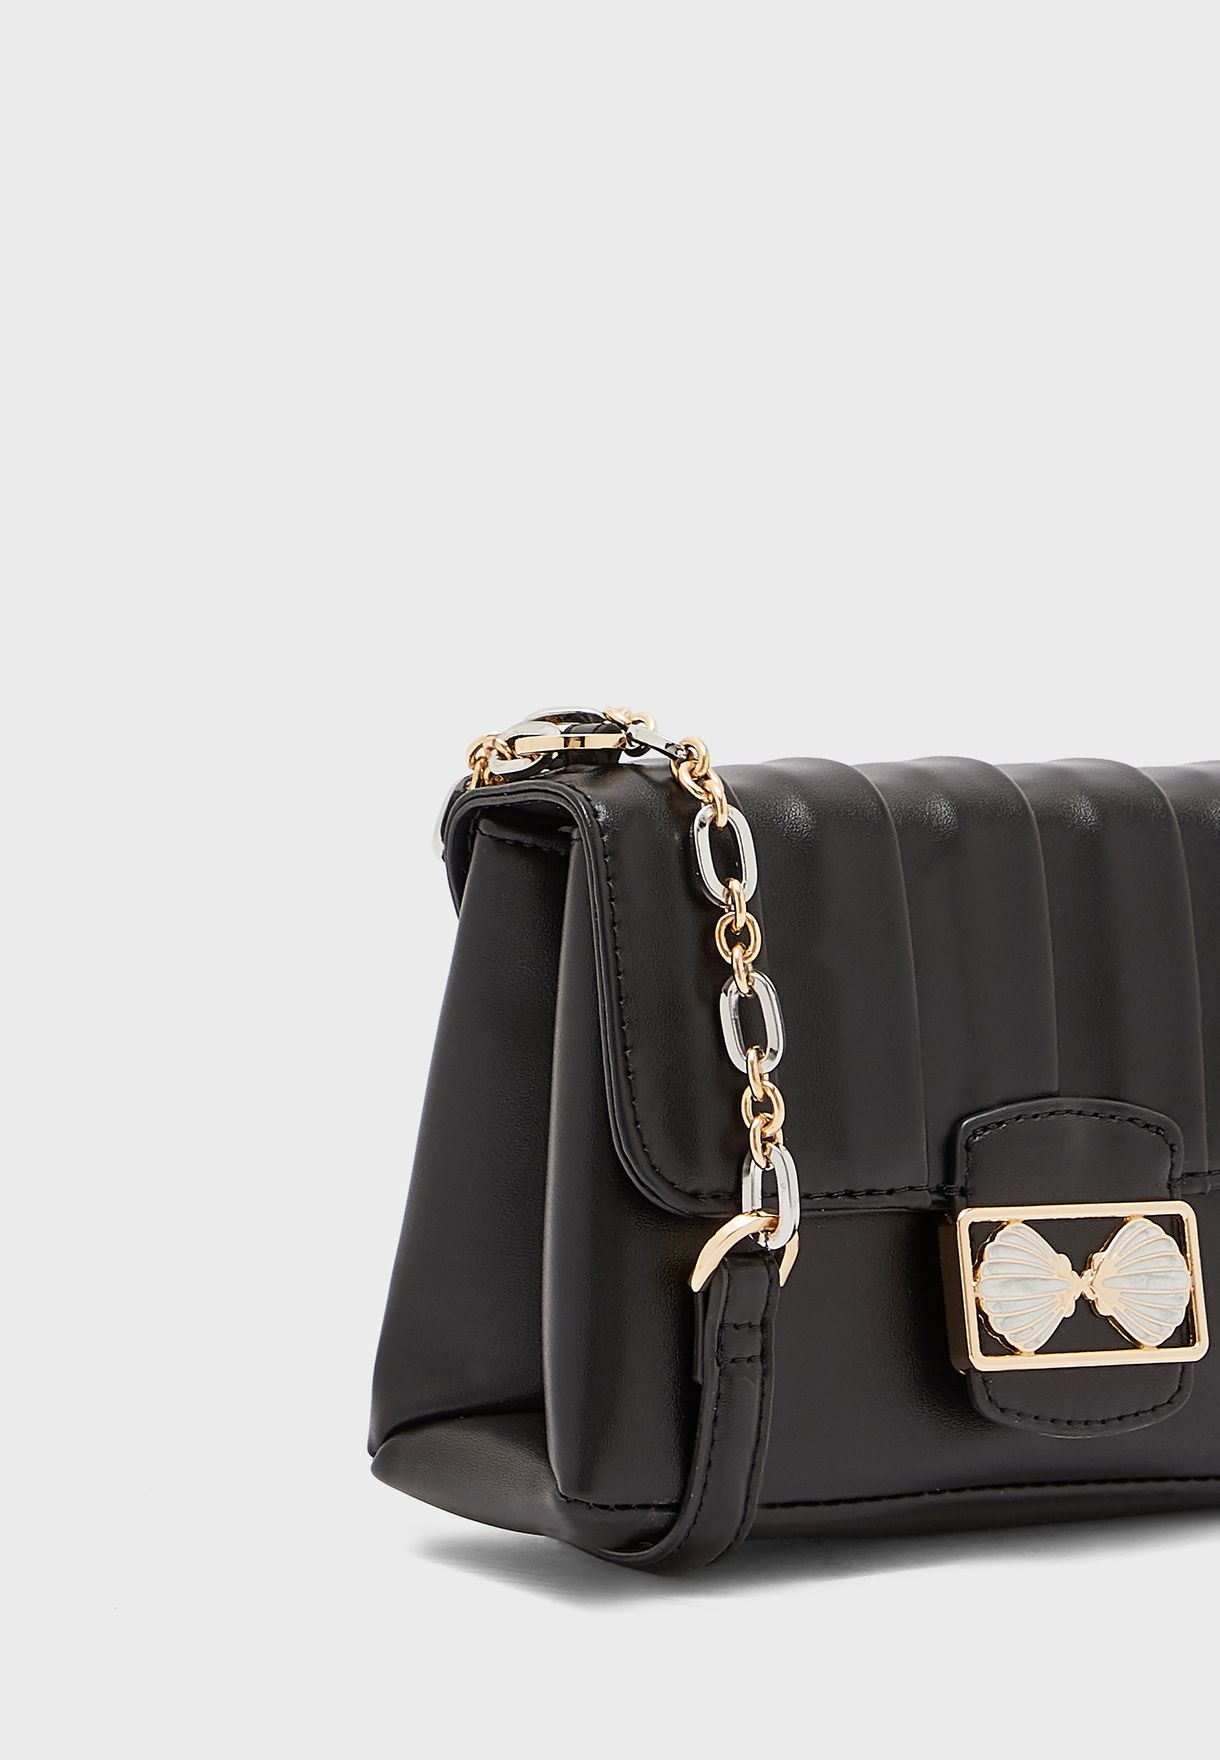 SHELLY Black Trophy Cross Body Bag